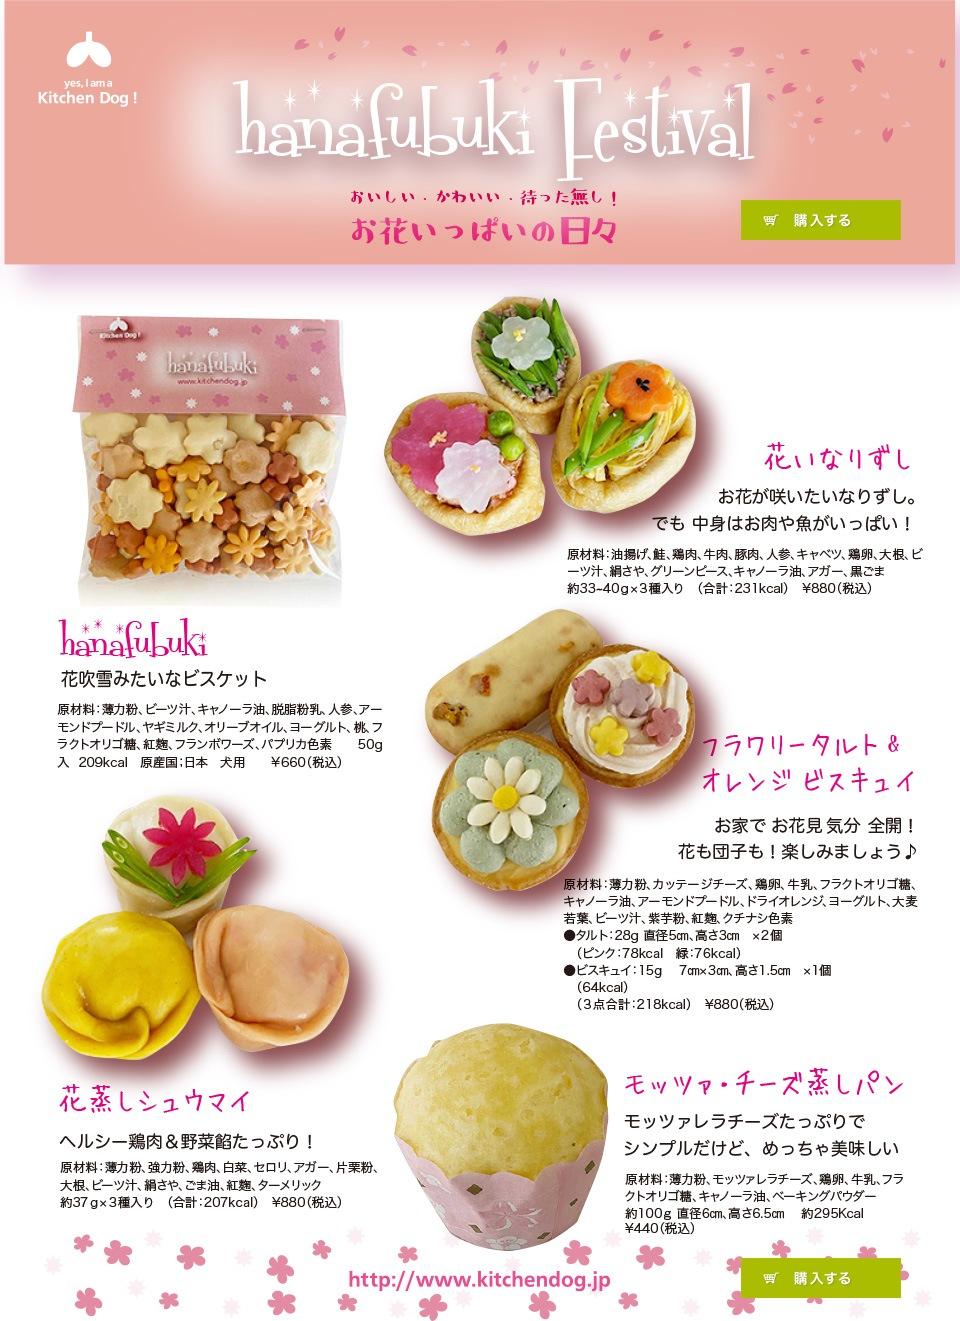 hanafubuki Festival お花いっぱいの日々